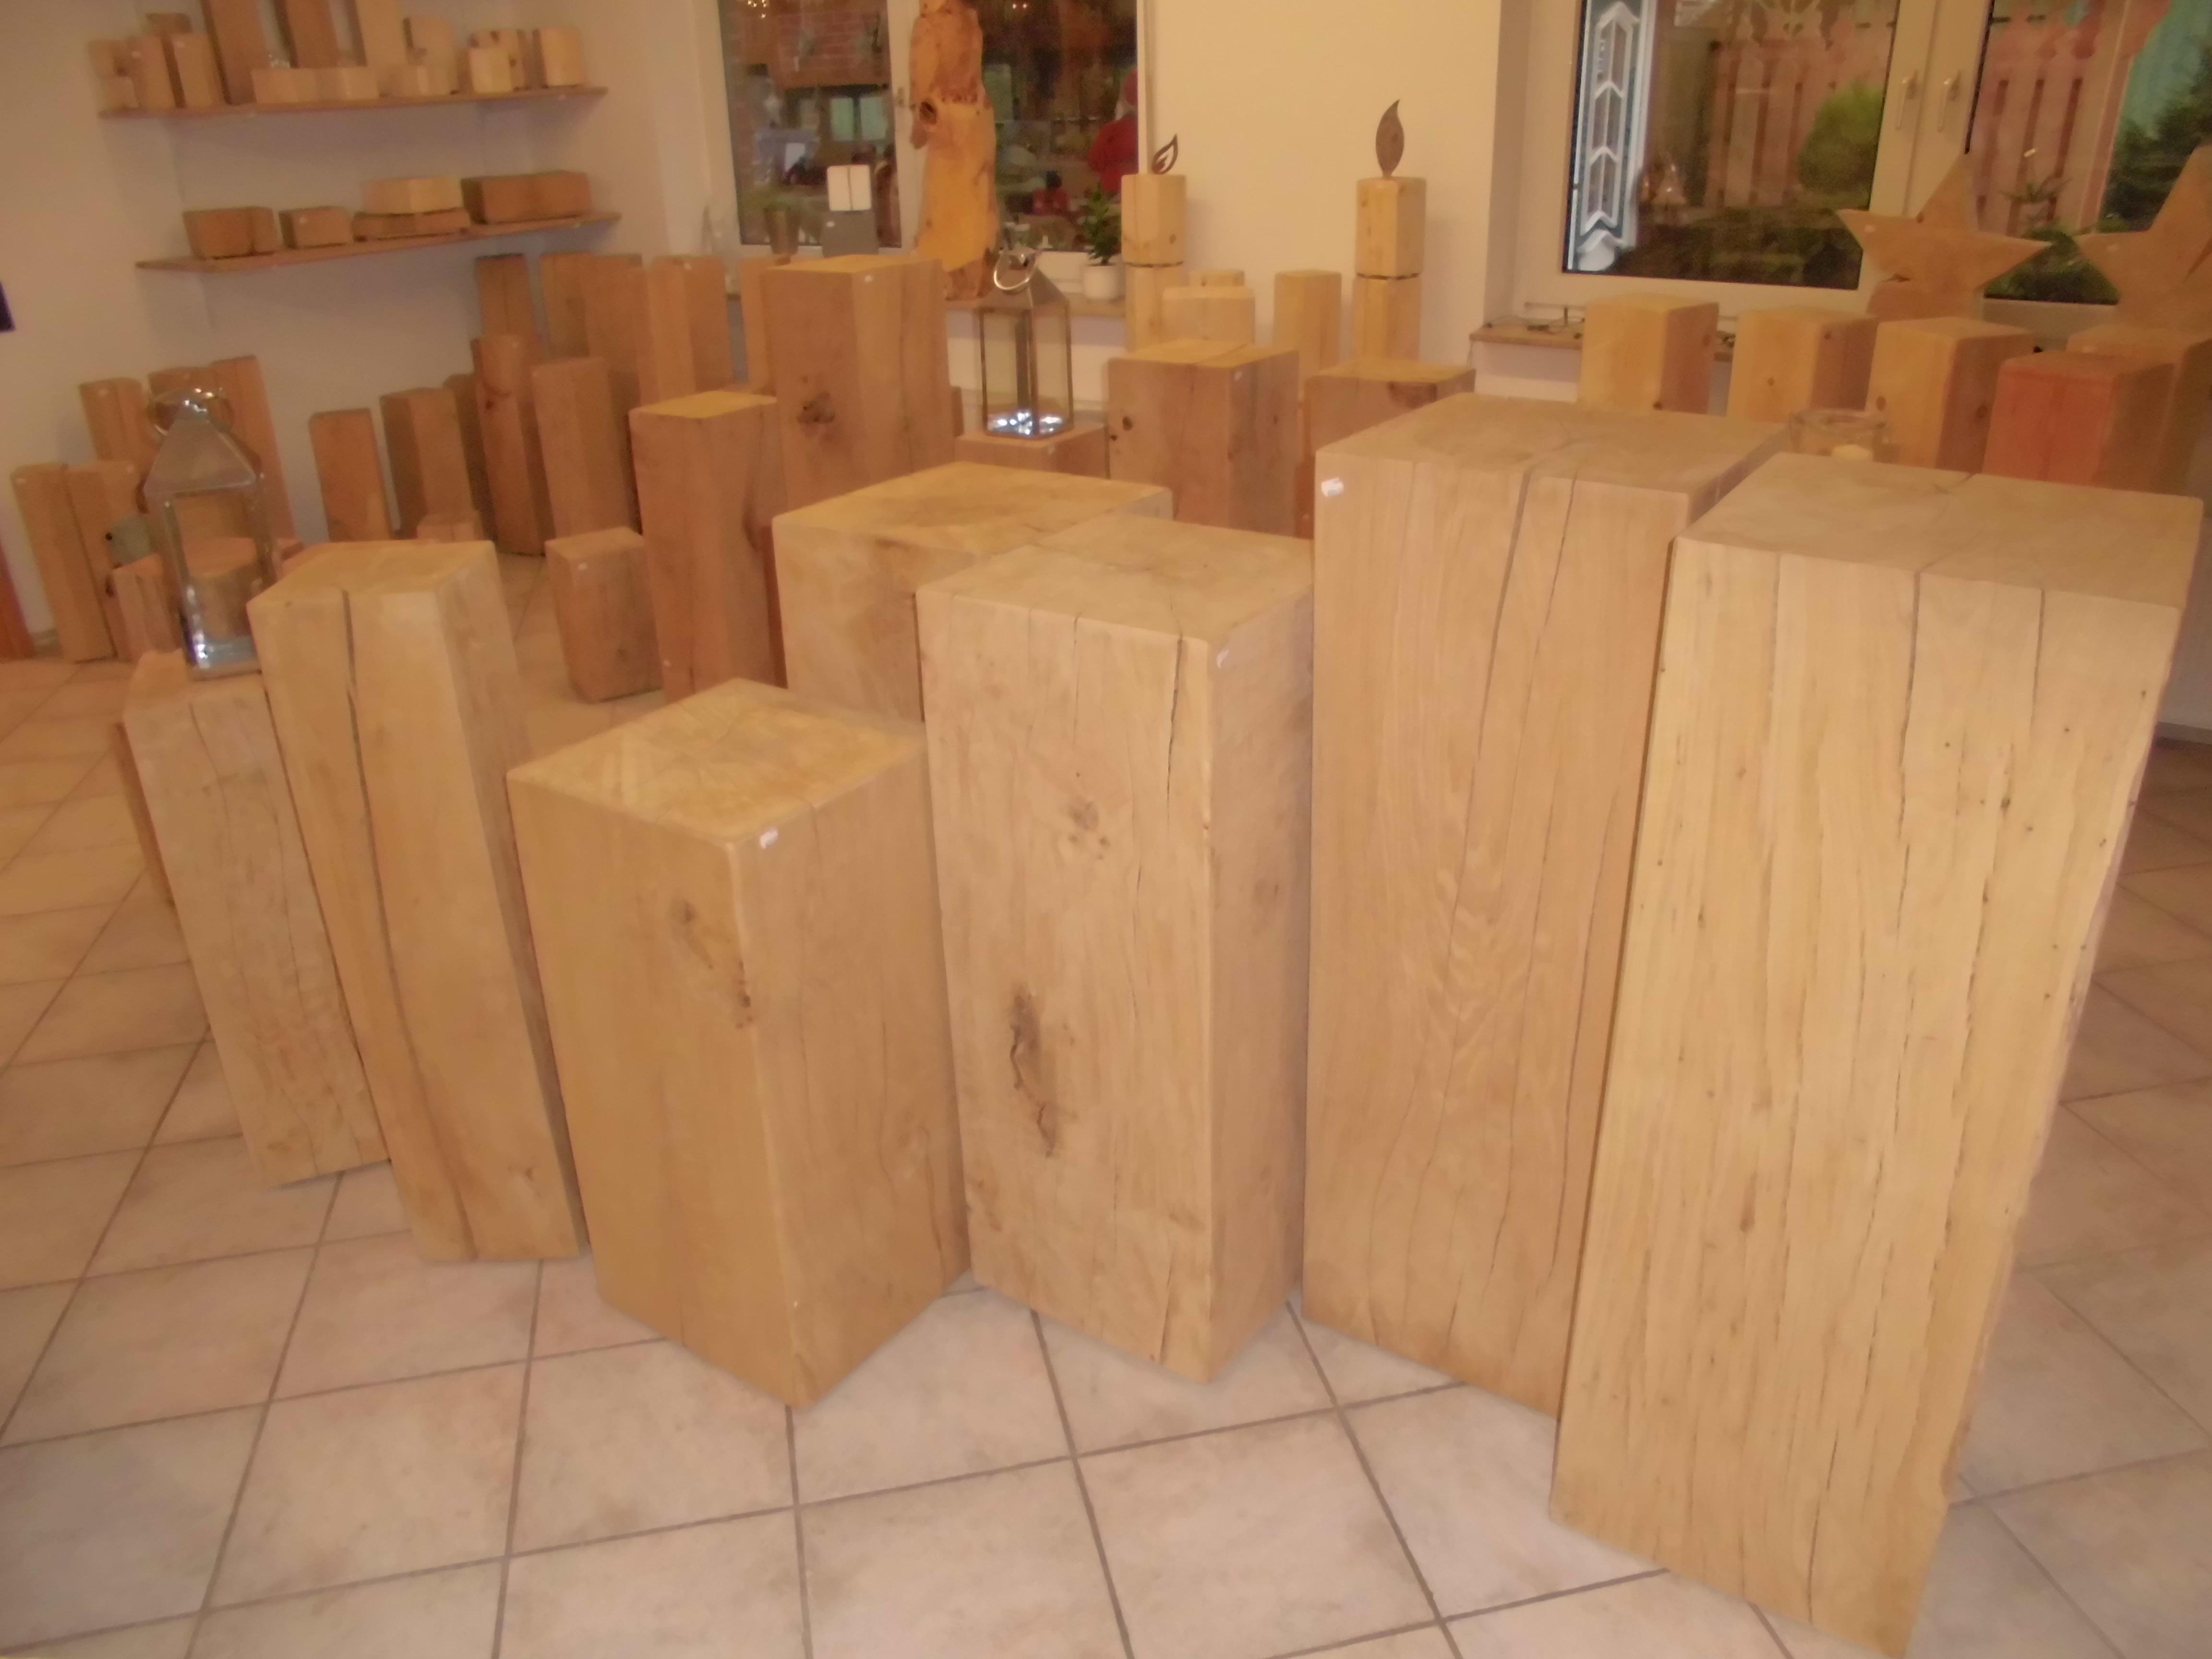 Eichenholzsäule gehobelt, geschliffen, angefast 40x40x45cm